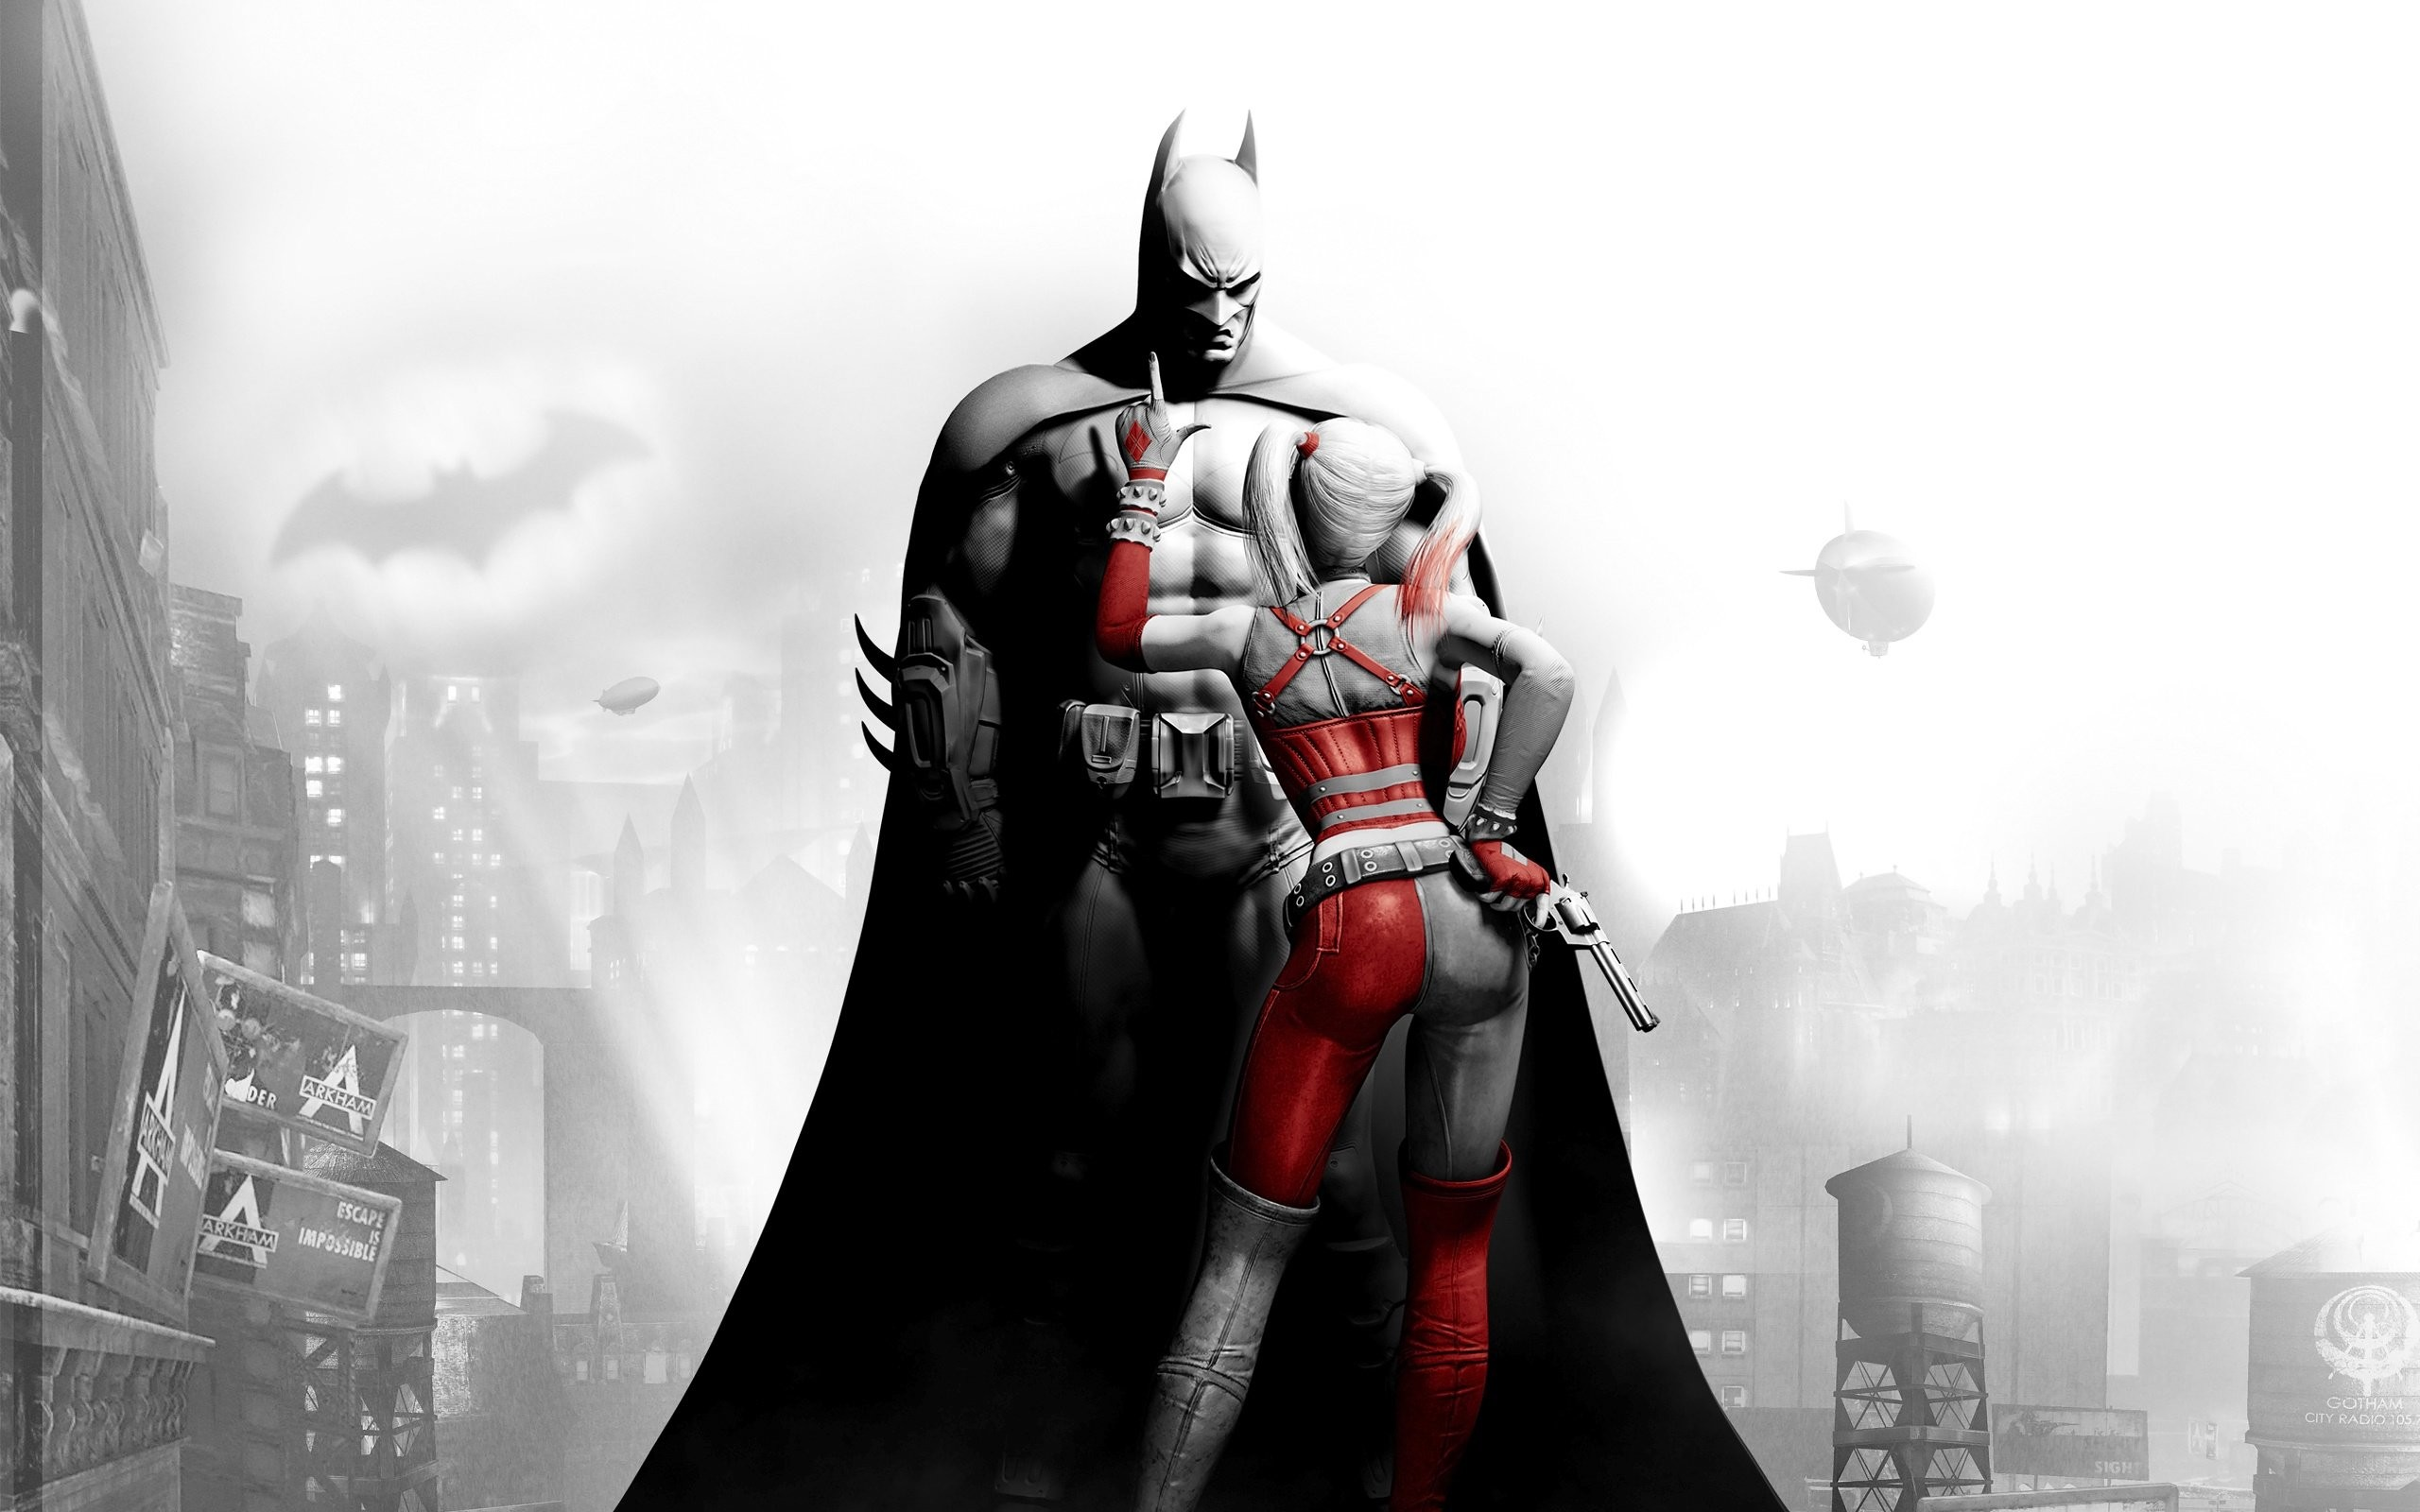 Res: 2560x1600, Wallpaper zu Batman: Arkham City herunterladen